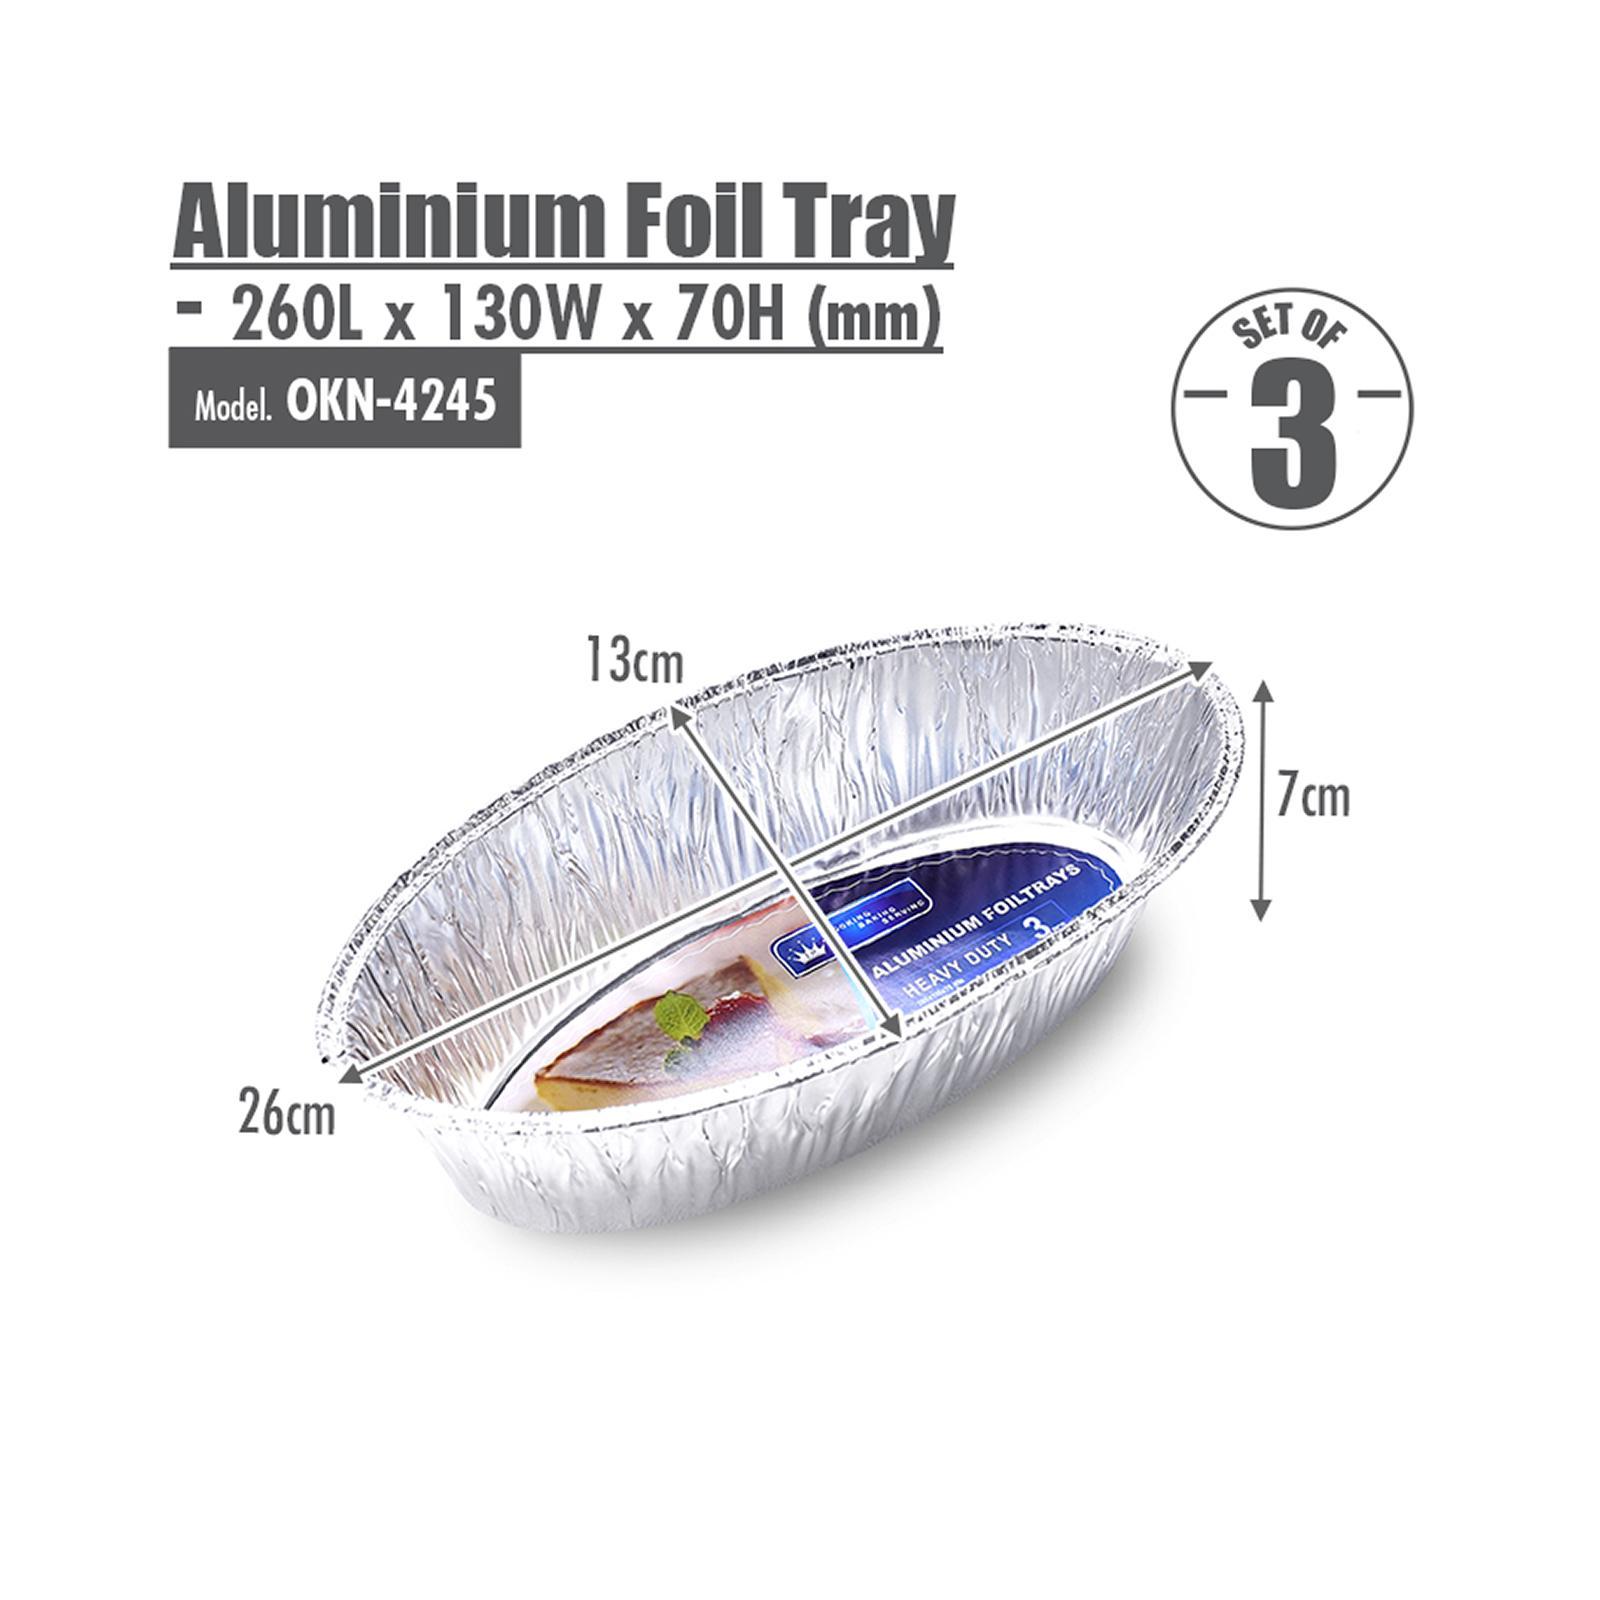 HOUZE Oval Aluminium Foil Roasting Pan - Set of 3